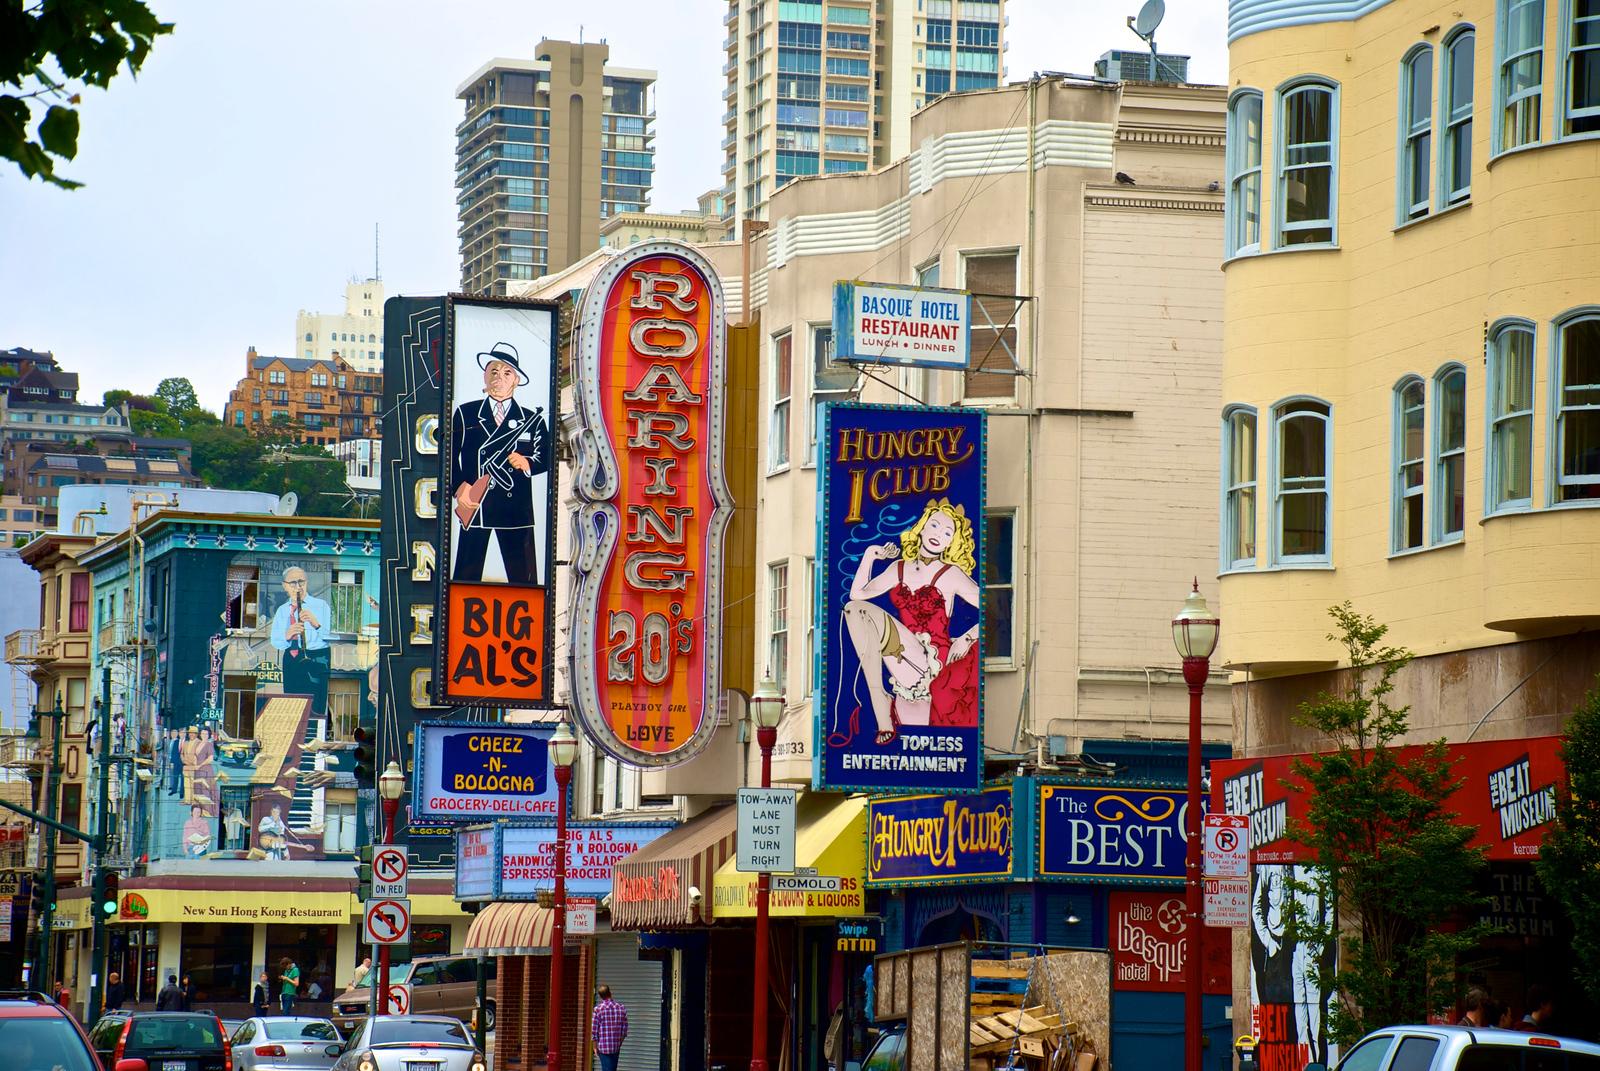 Oakland/San Francisco July 2012